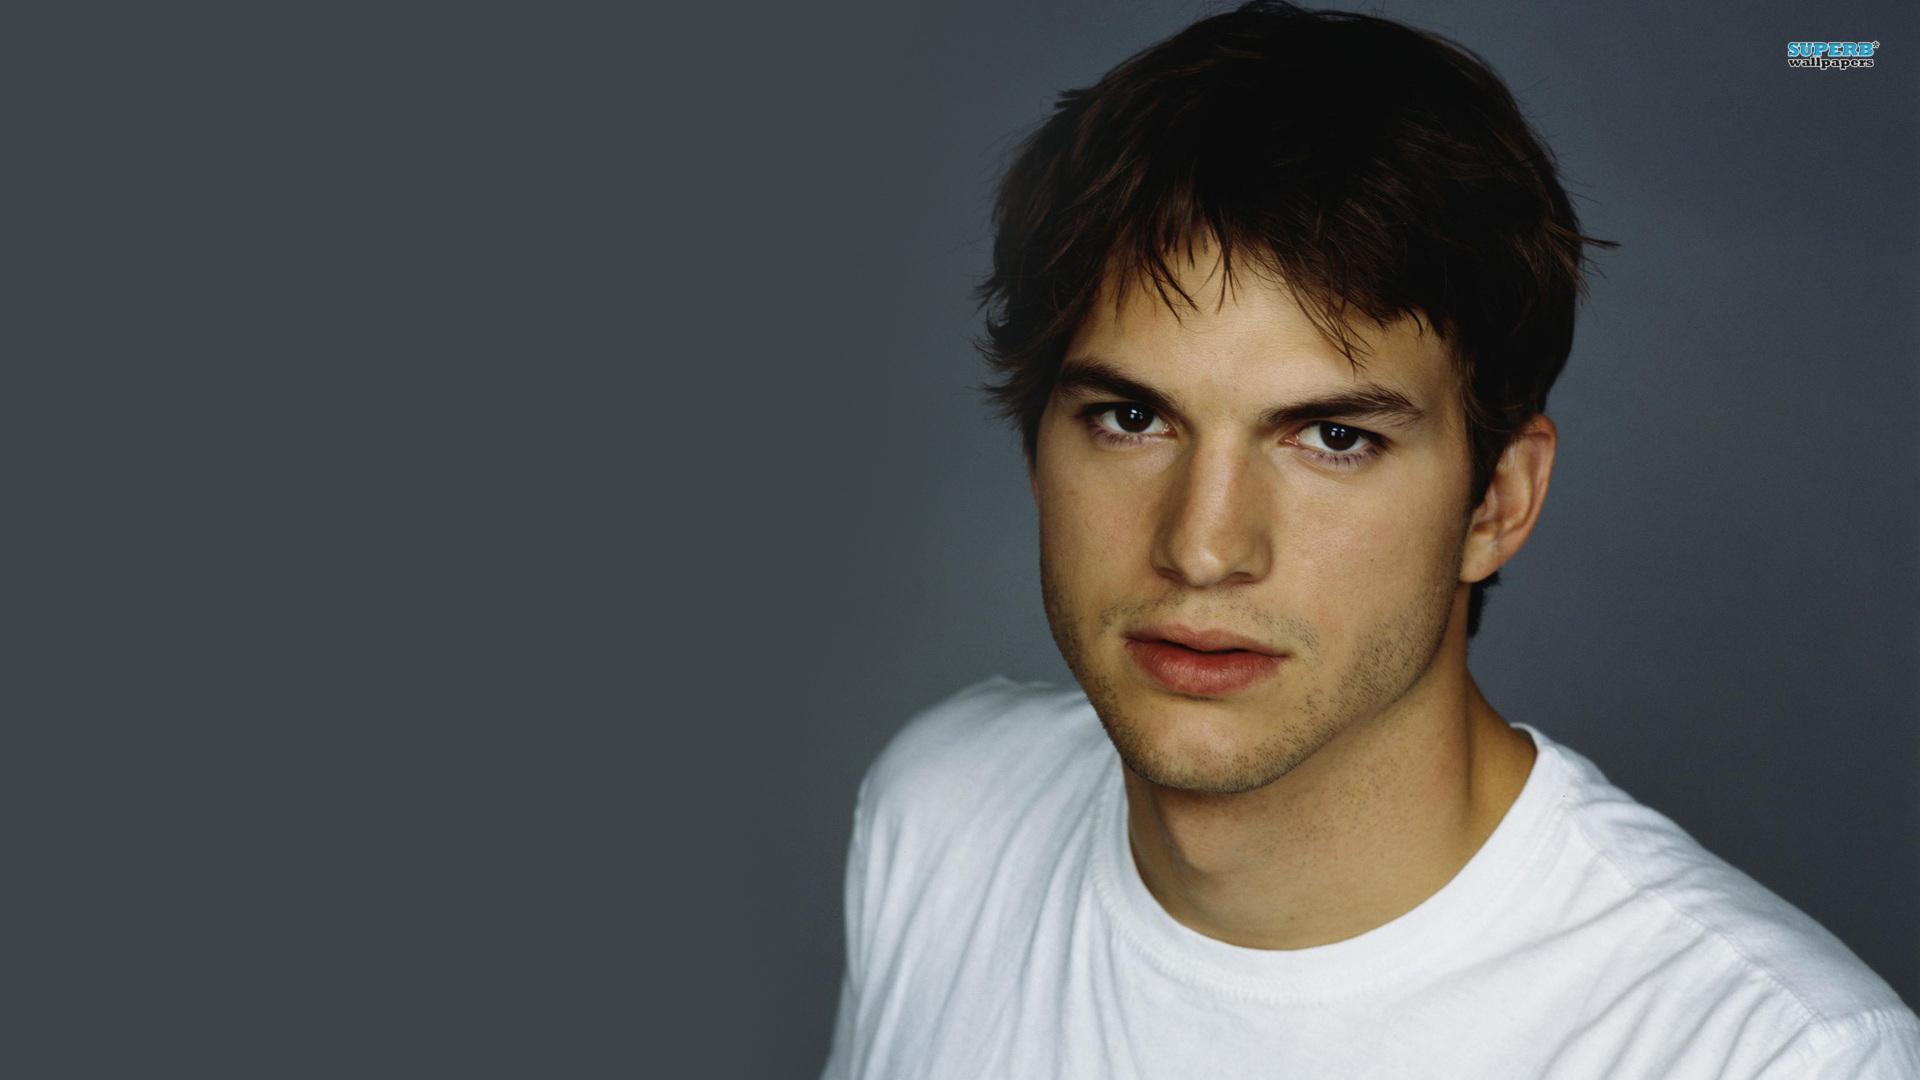 Ashton Kutcher As A Child HD Wallpaper Background Images 1920x1080